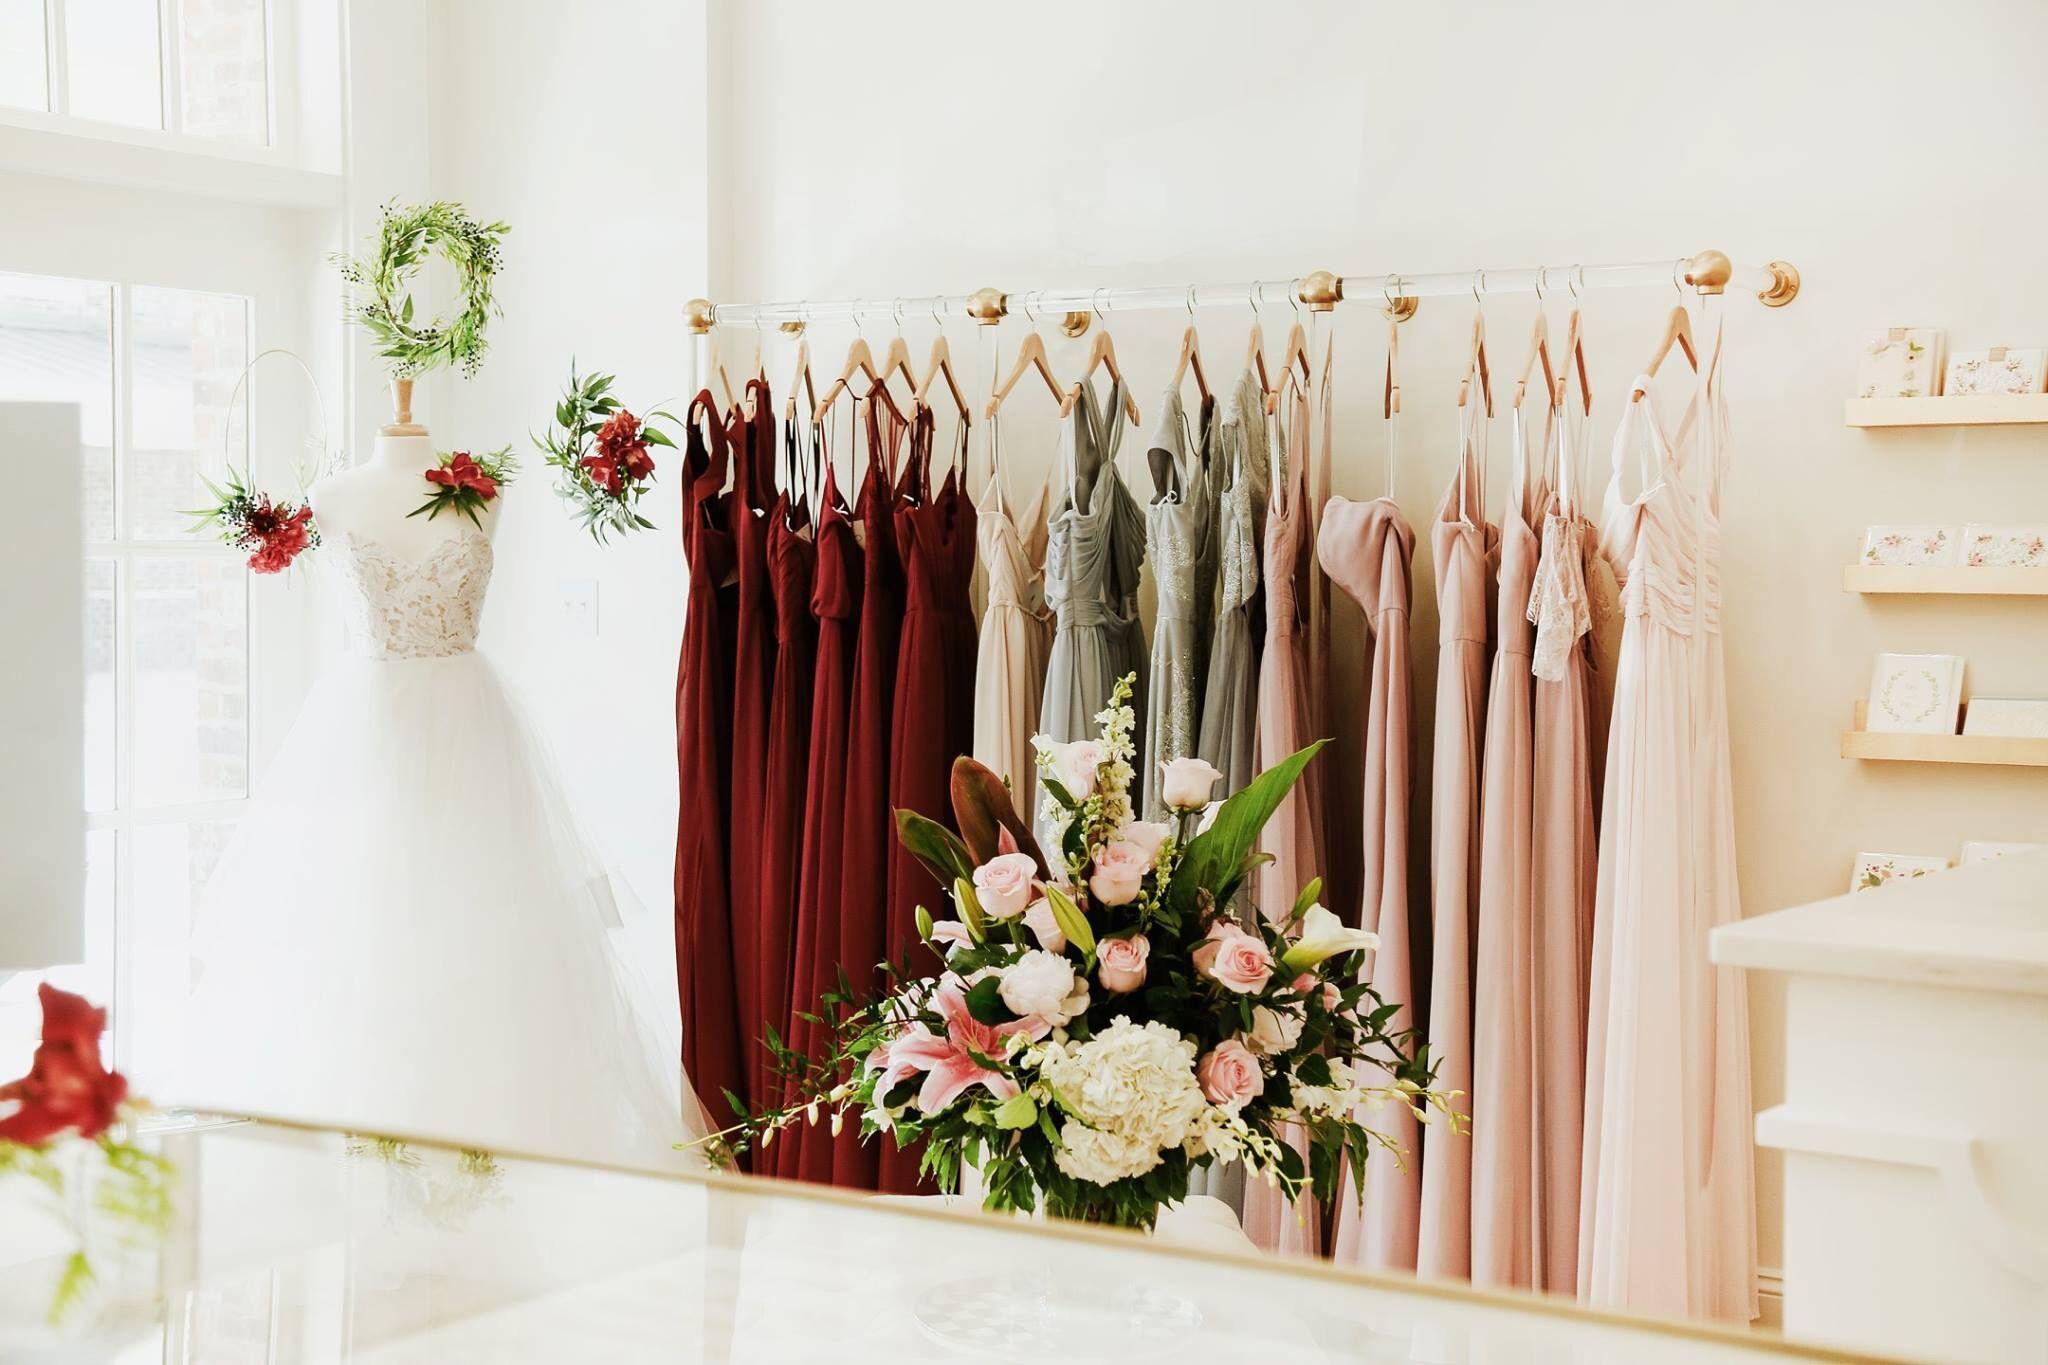 Bridal Salons In Hammond La The Knot